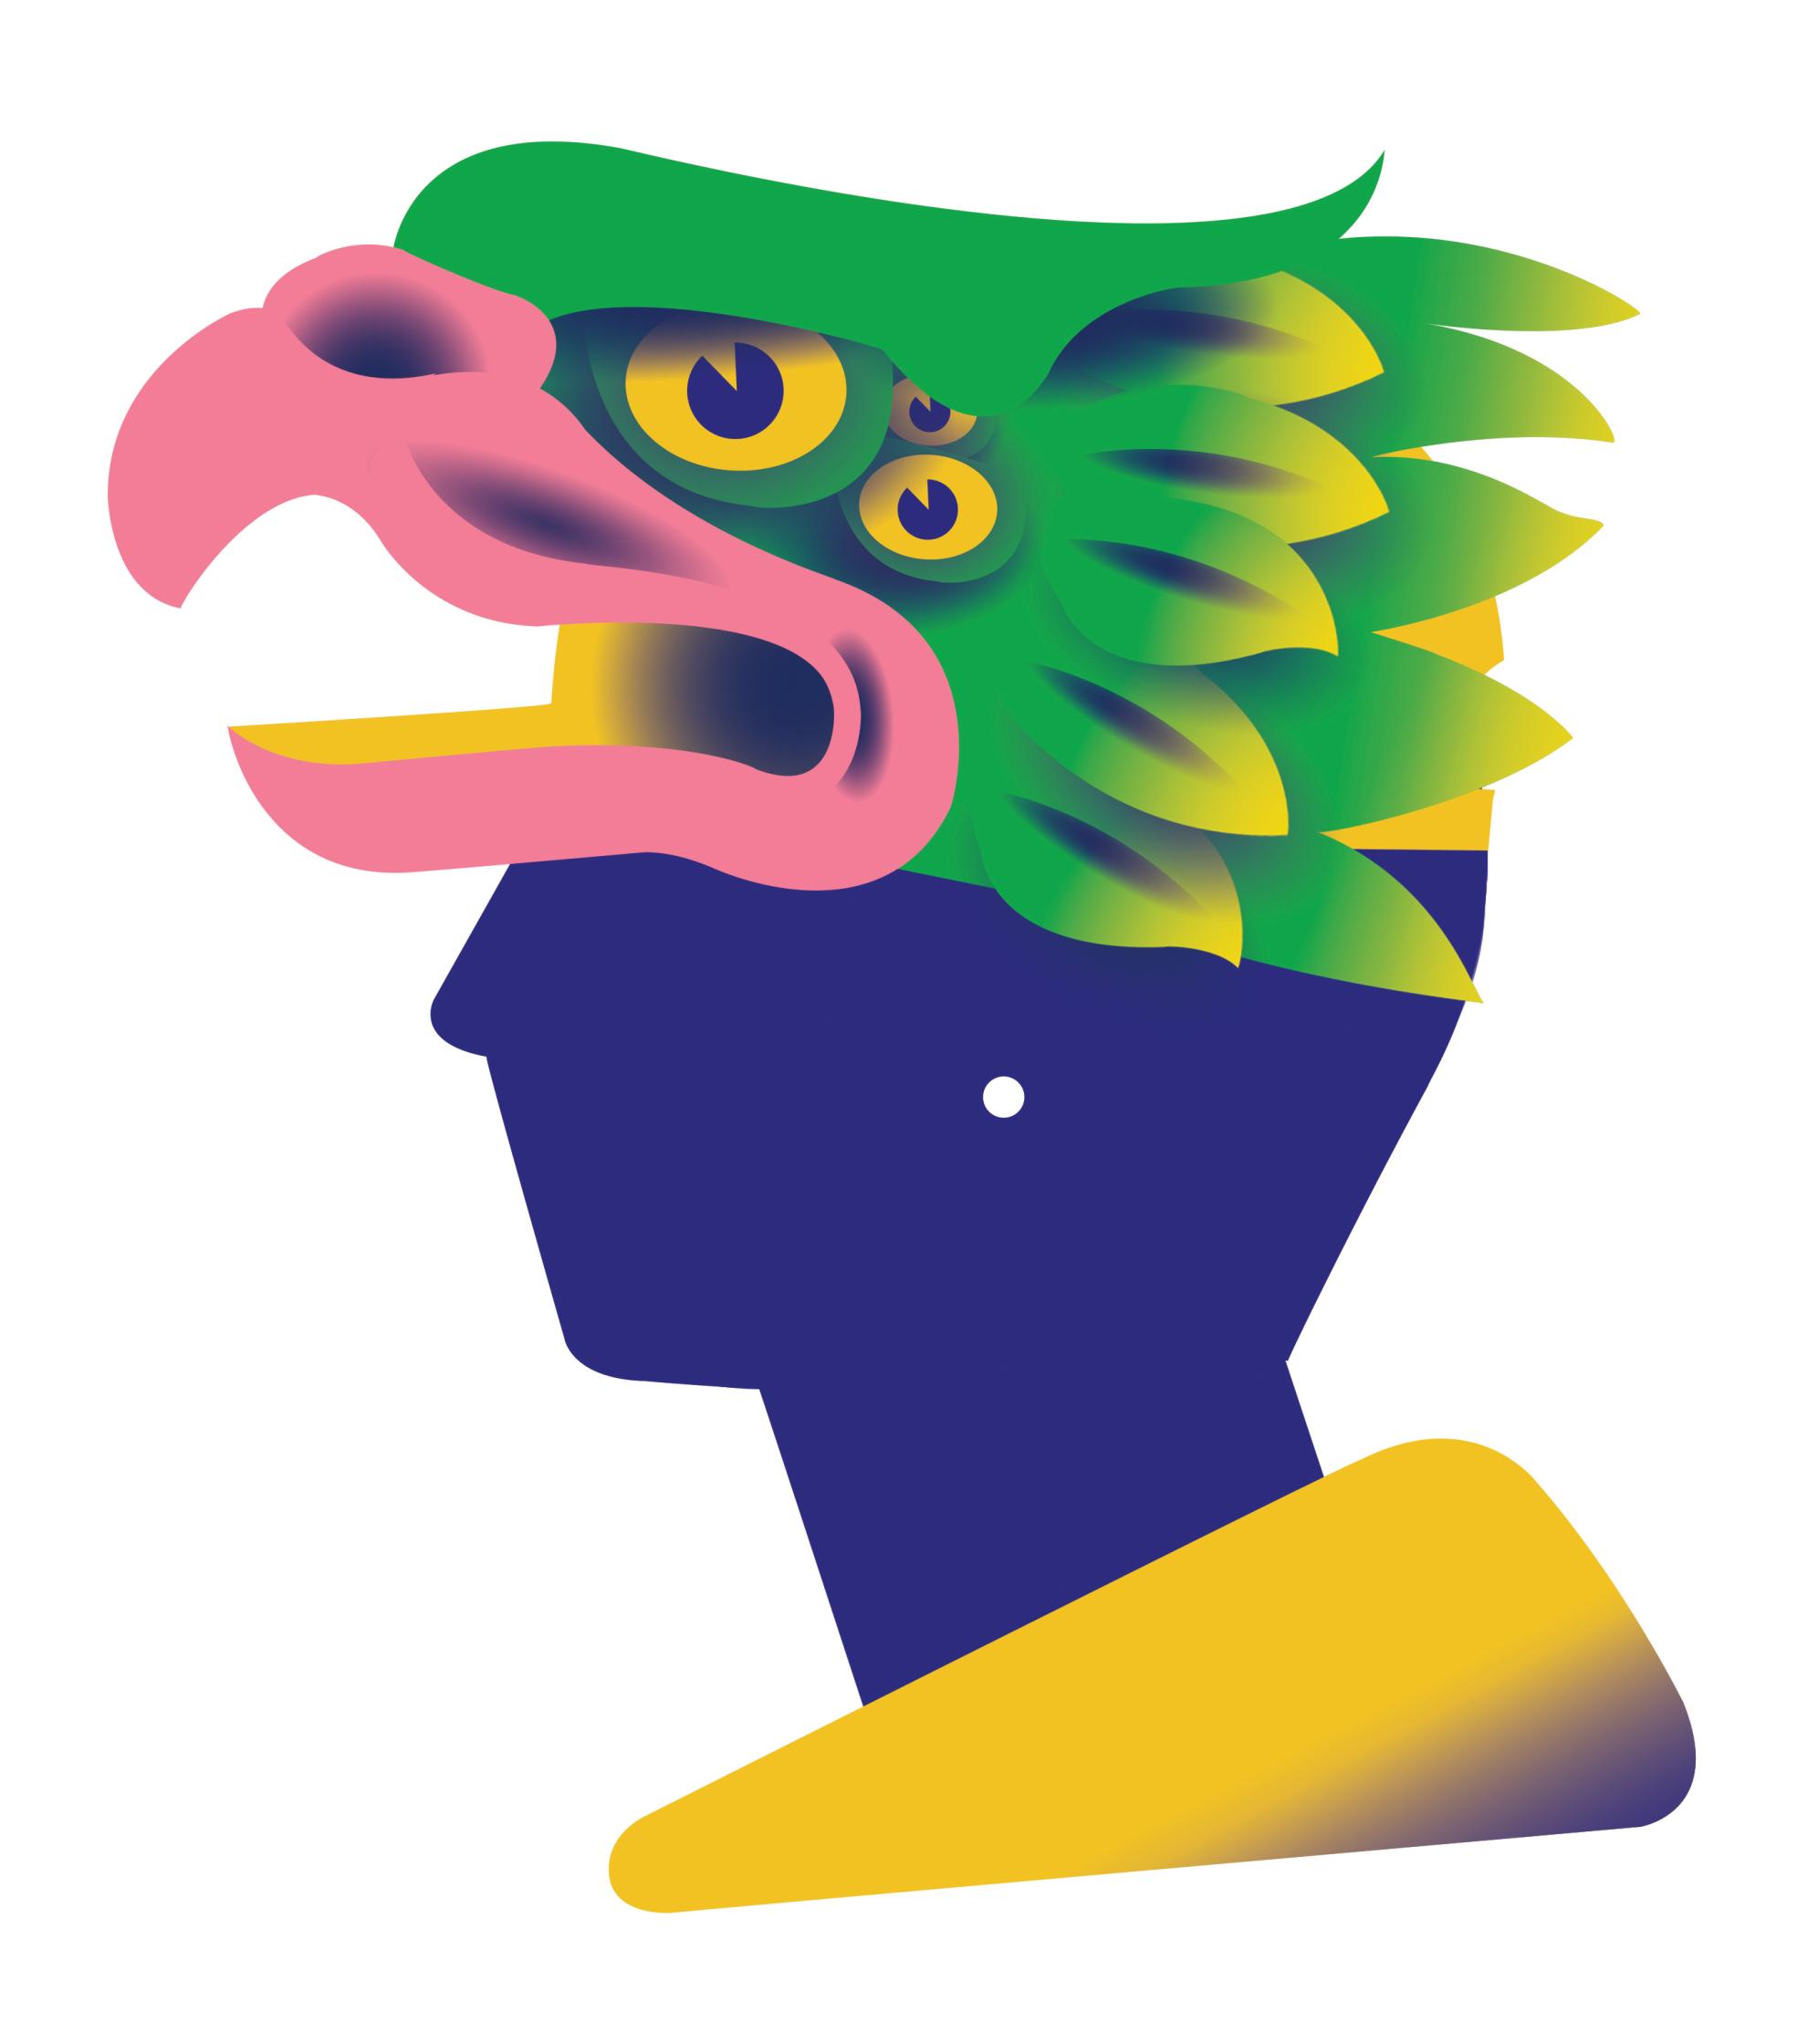 fantastical eagle cap.jpg